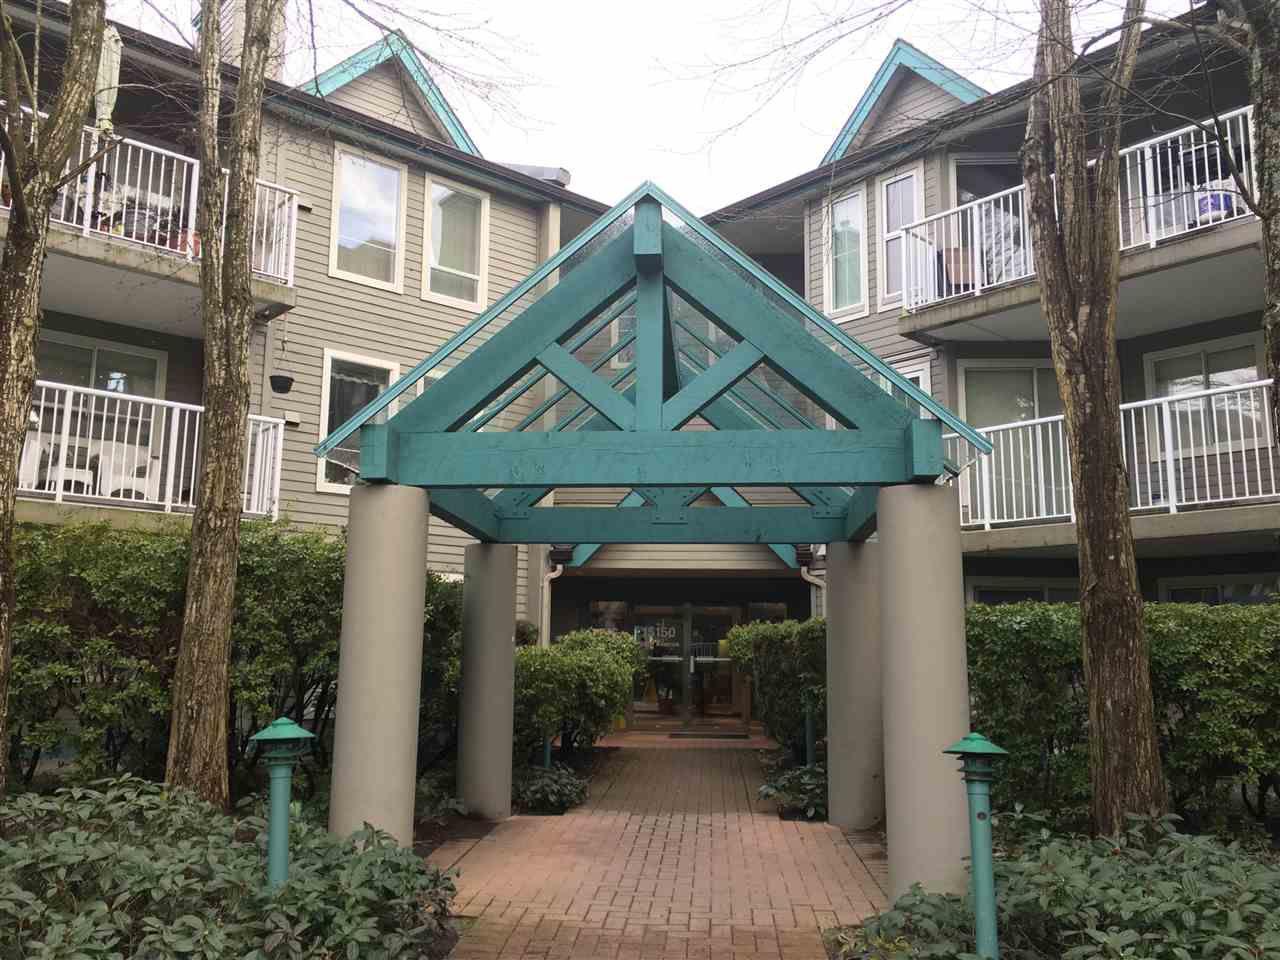 Main Photo: 106 15150 108TH AVENUE in Surrey: Bolivar Heights Condo for sale (North Surrey)  : MLS®# R2148396